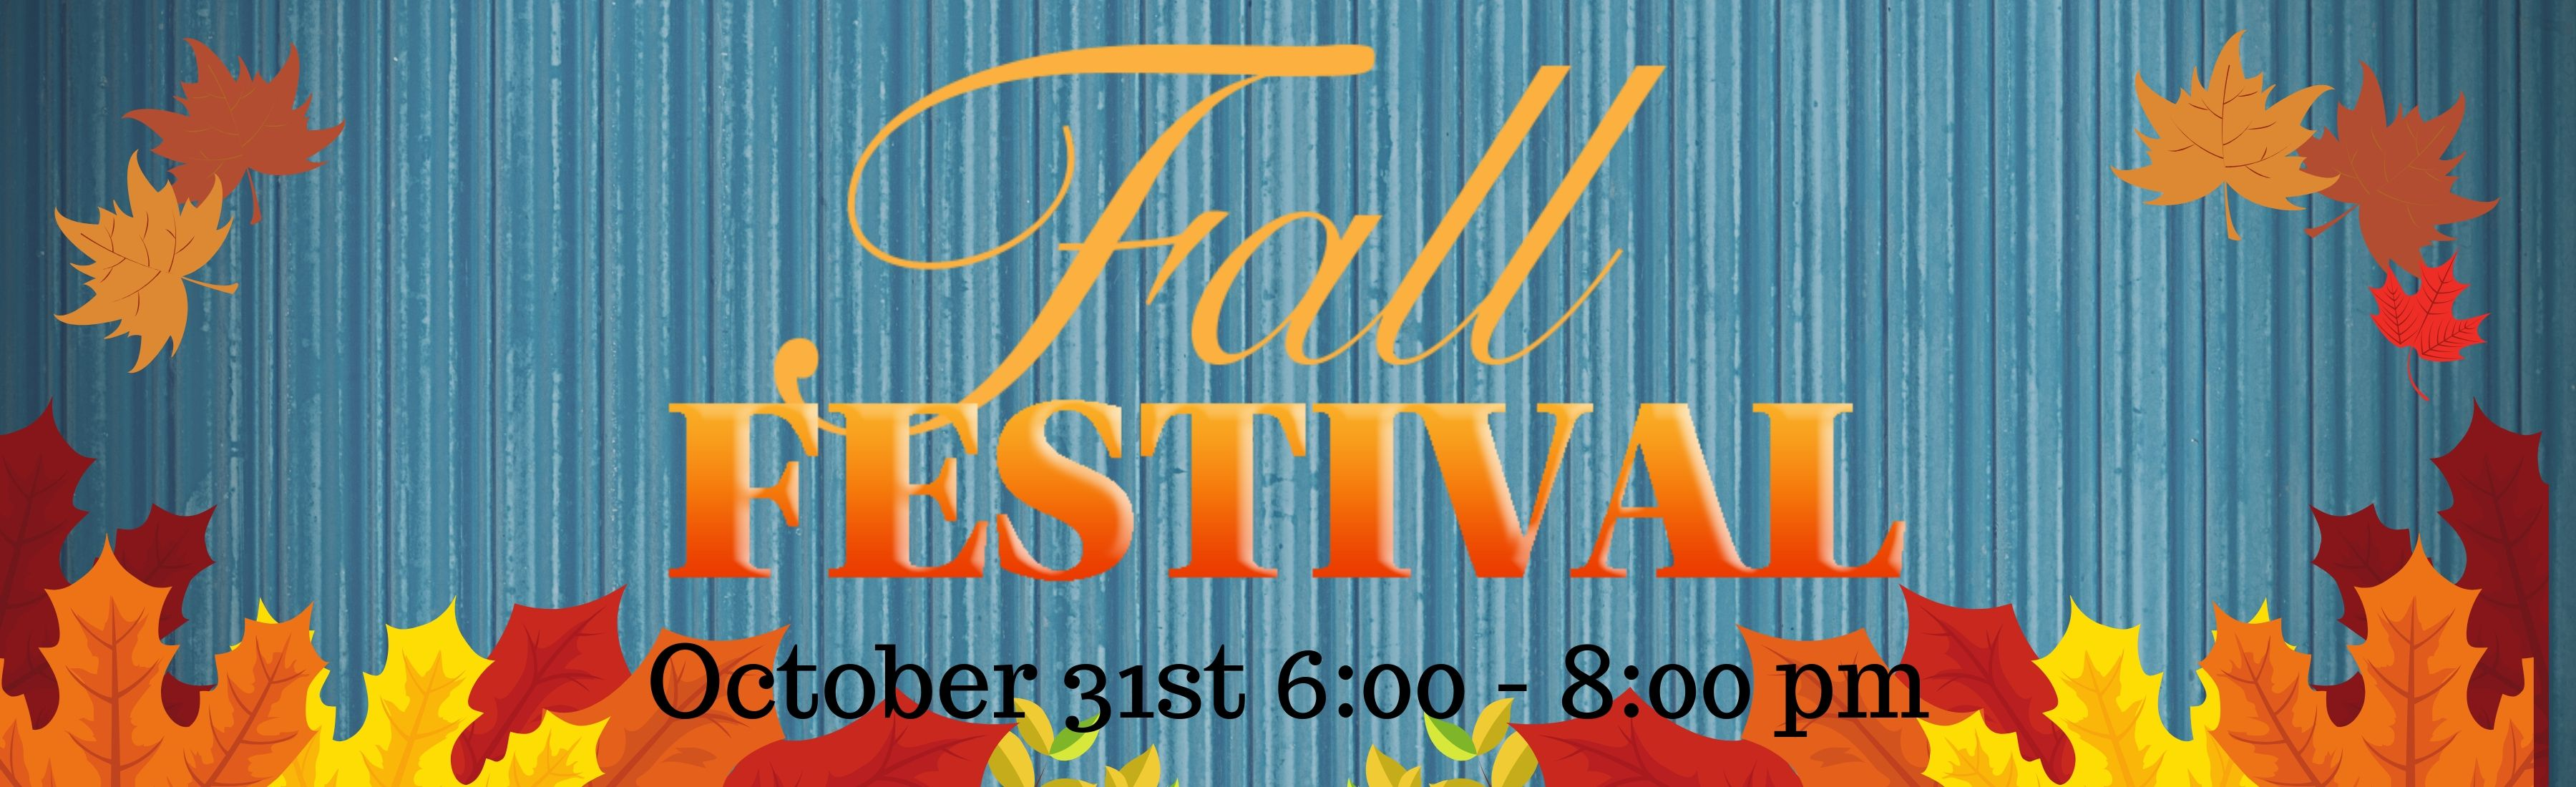 Fall Festival 3600x1100